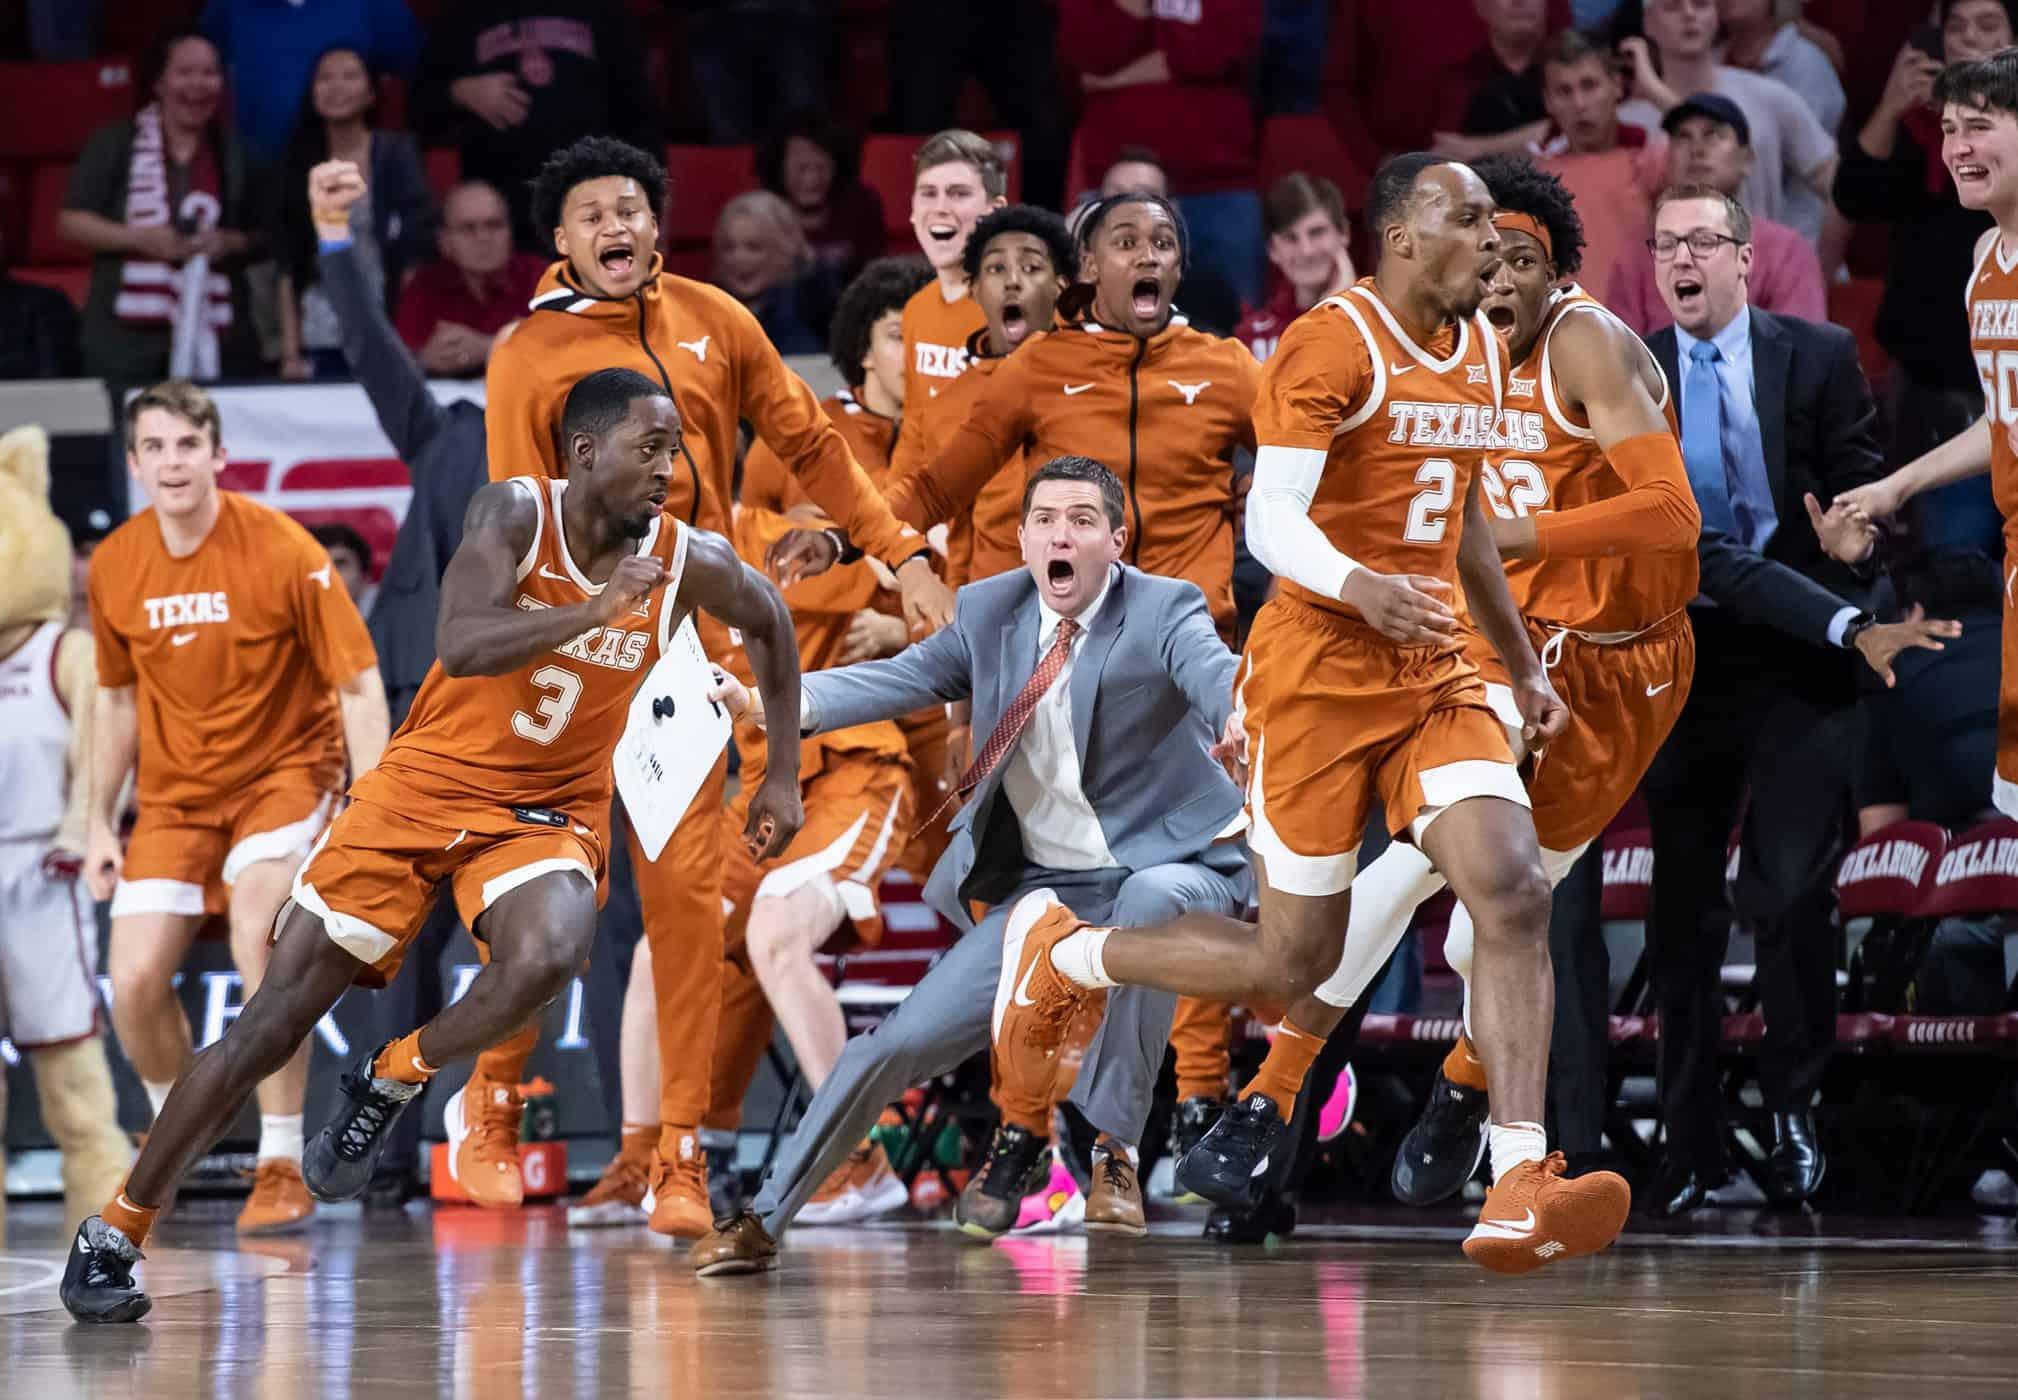 Texas buzzer Oklahoma March Madness